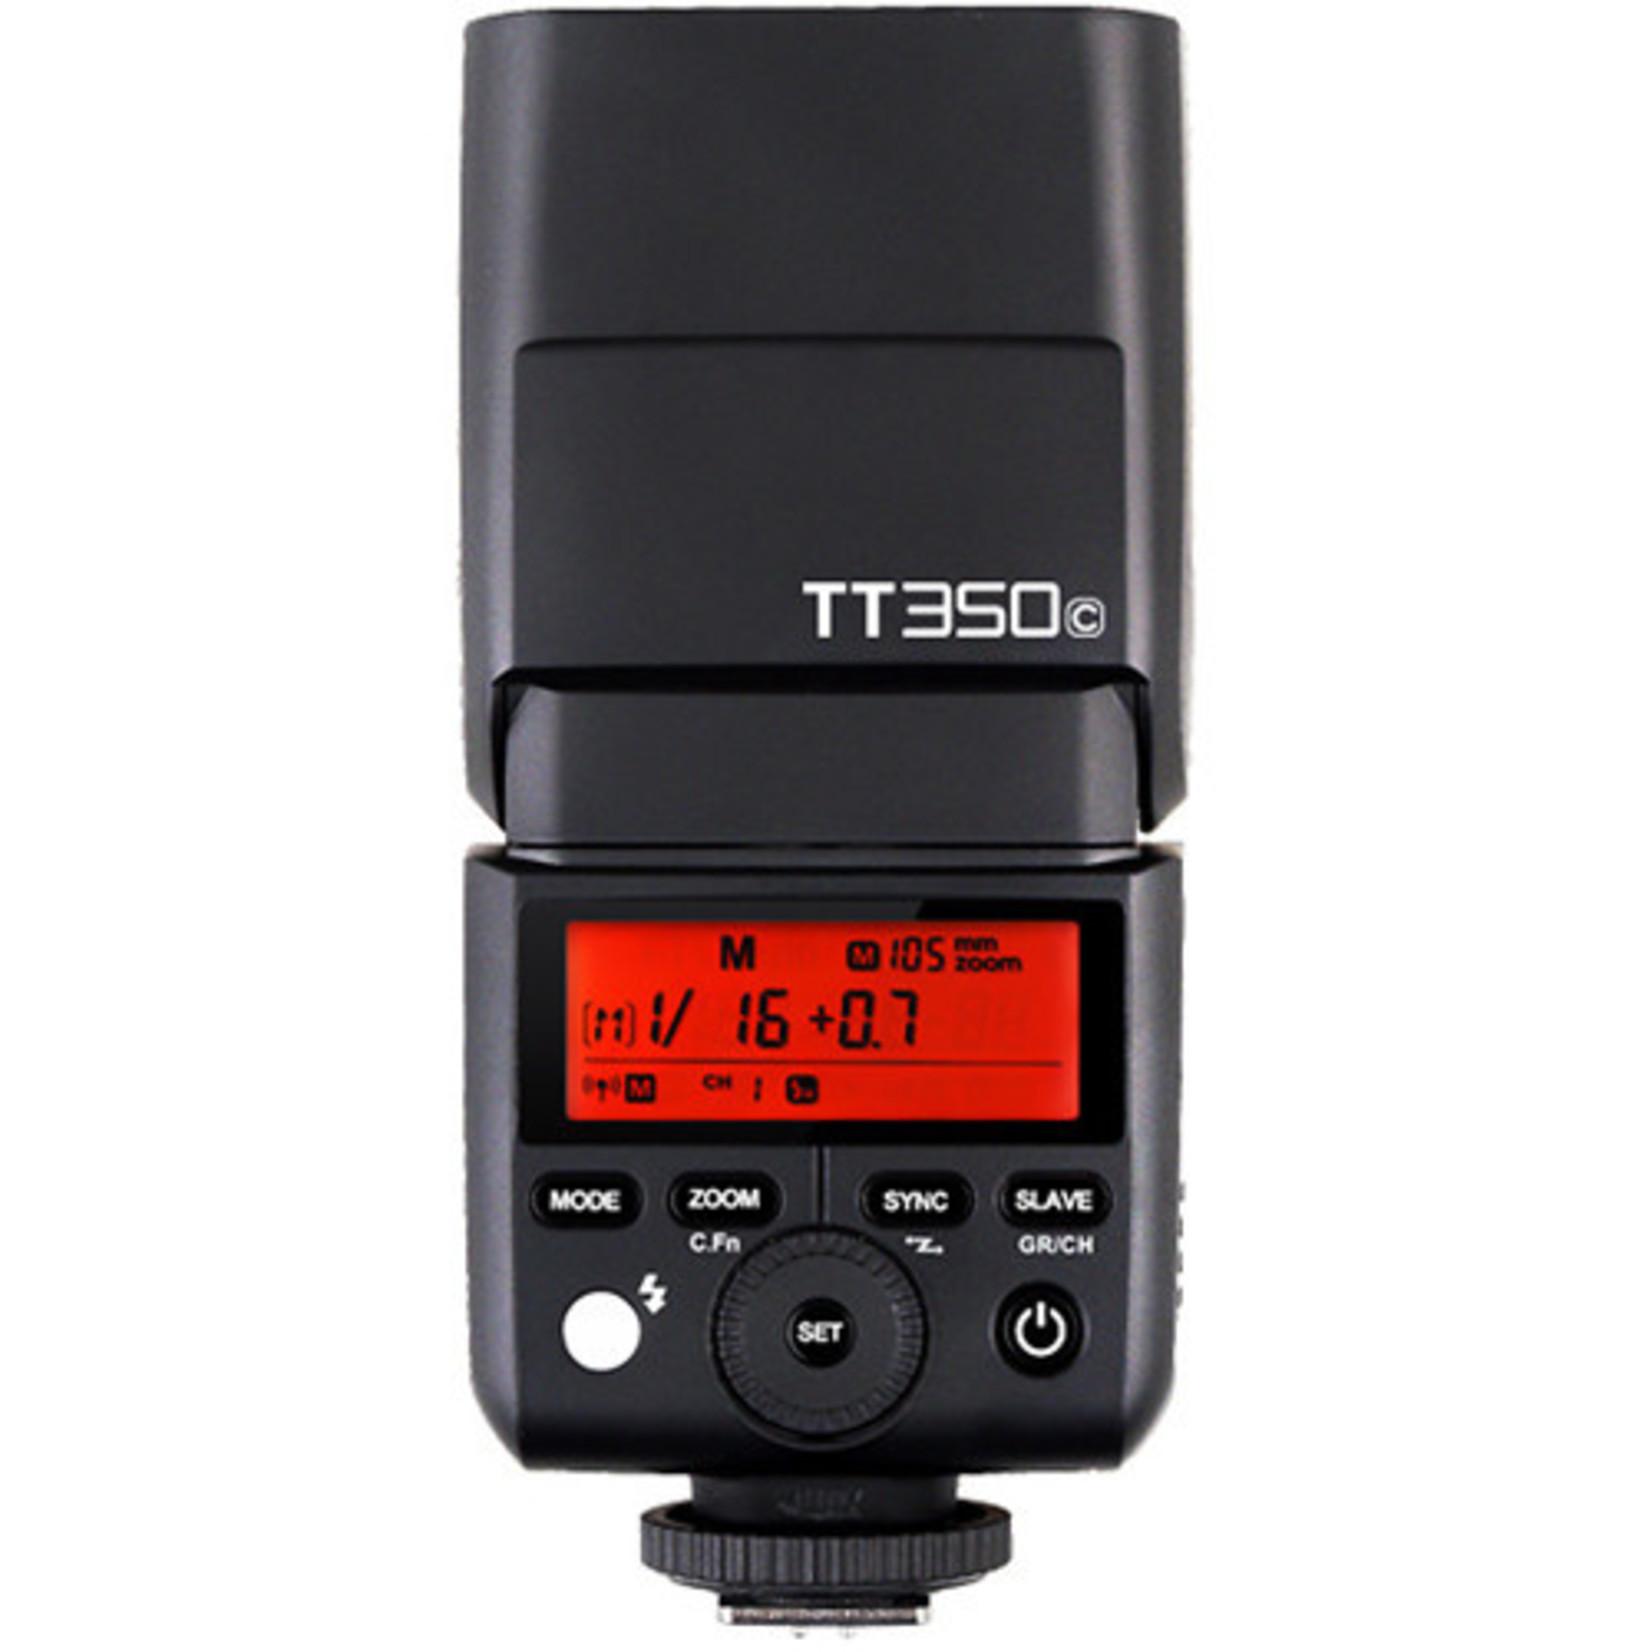 Godox GodoxTT350 Mini Thinklite AA Powered Flash for Canon